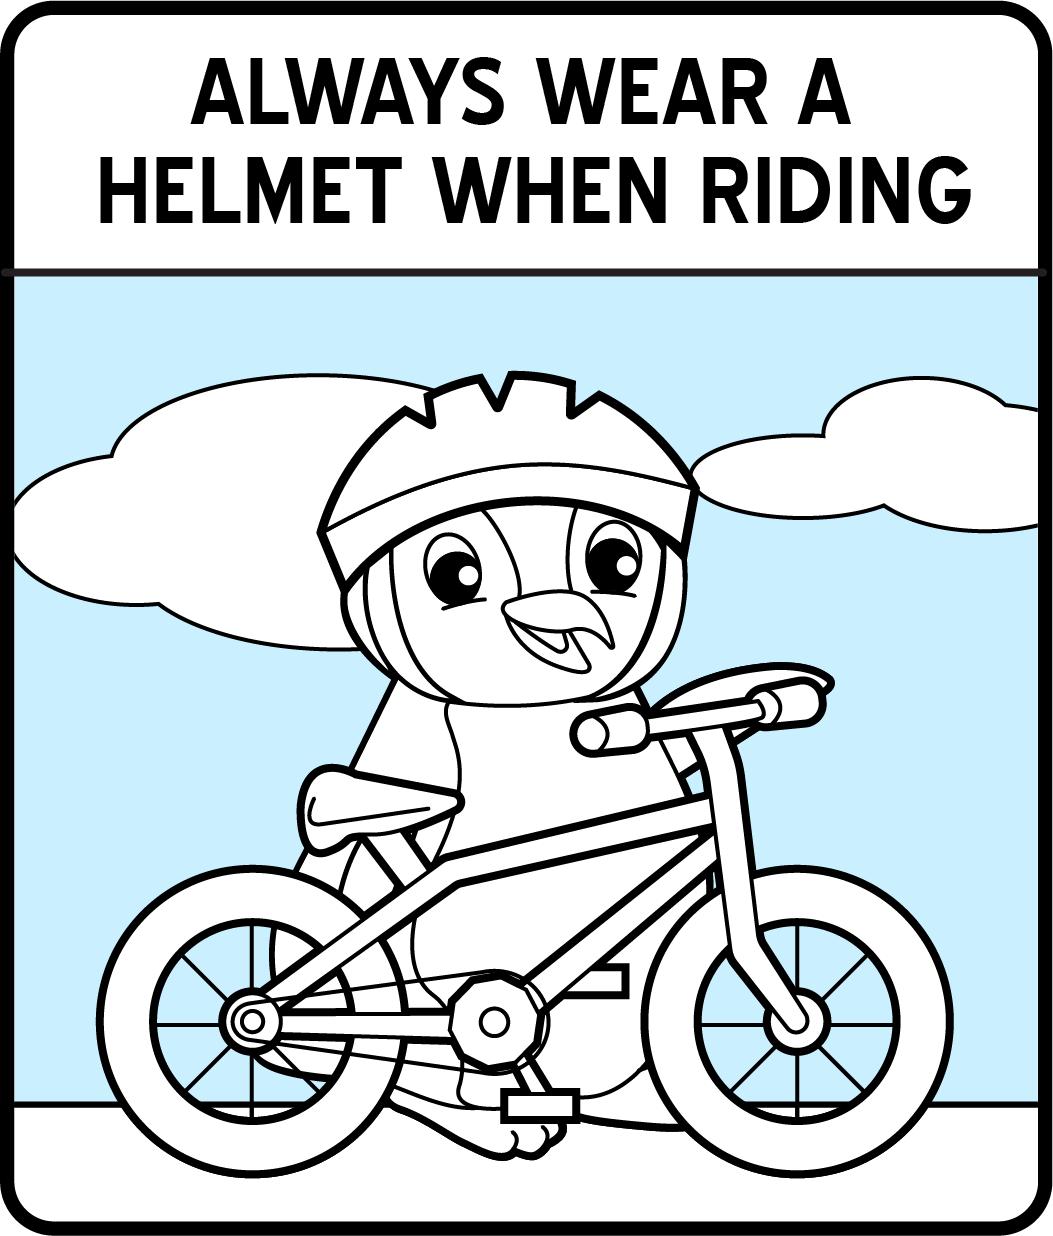 A cartoon penguin wearing a helmet and holding a bike.